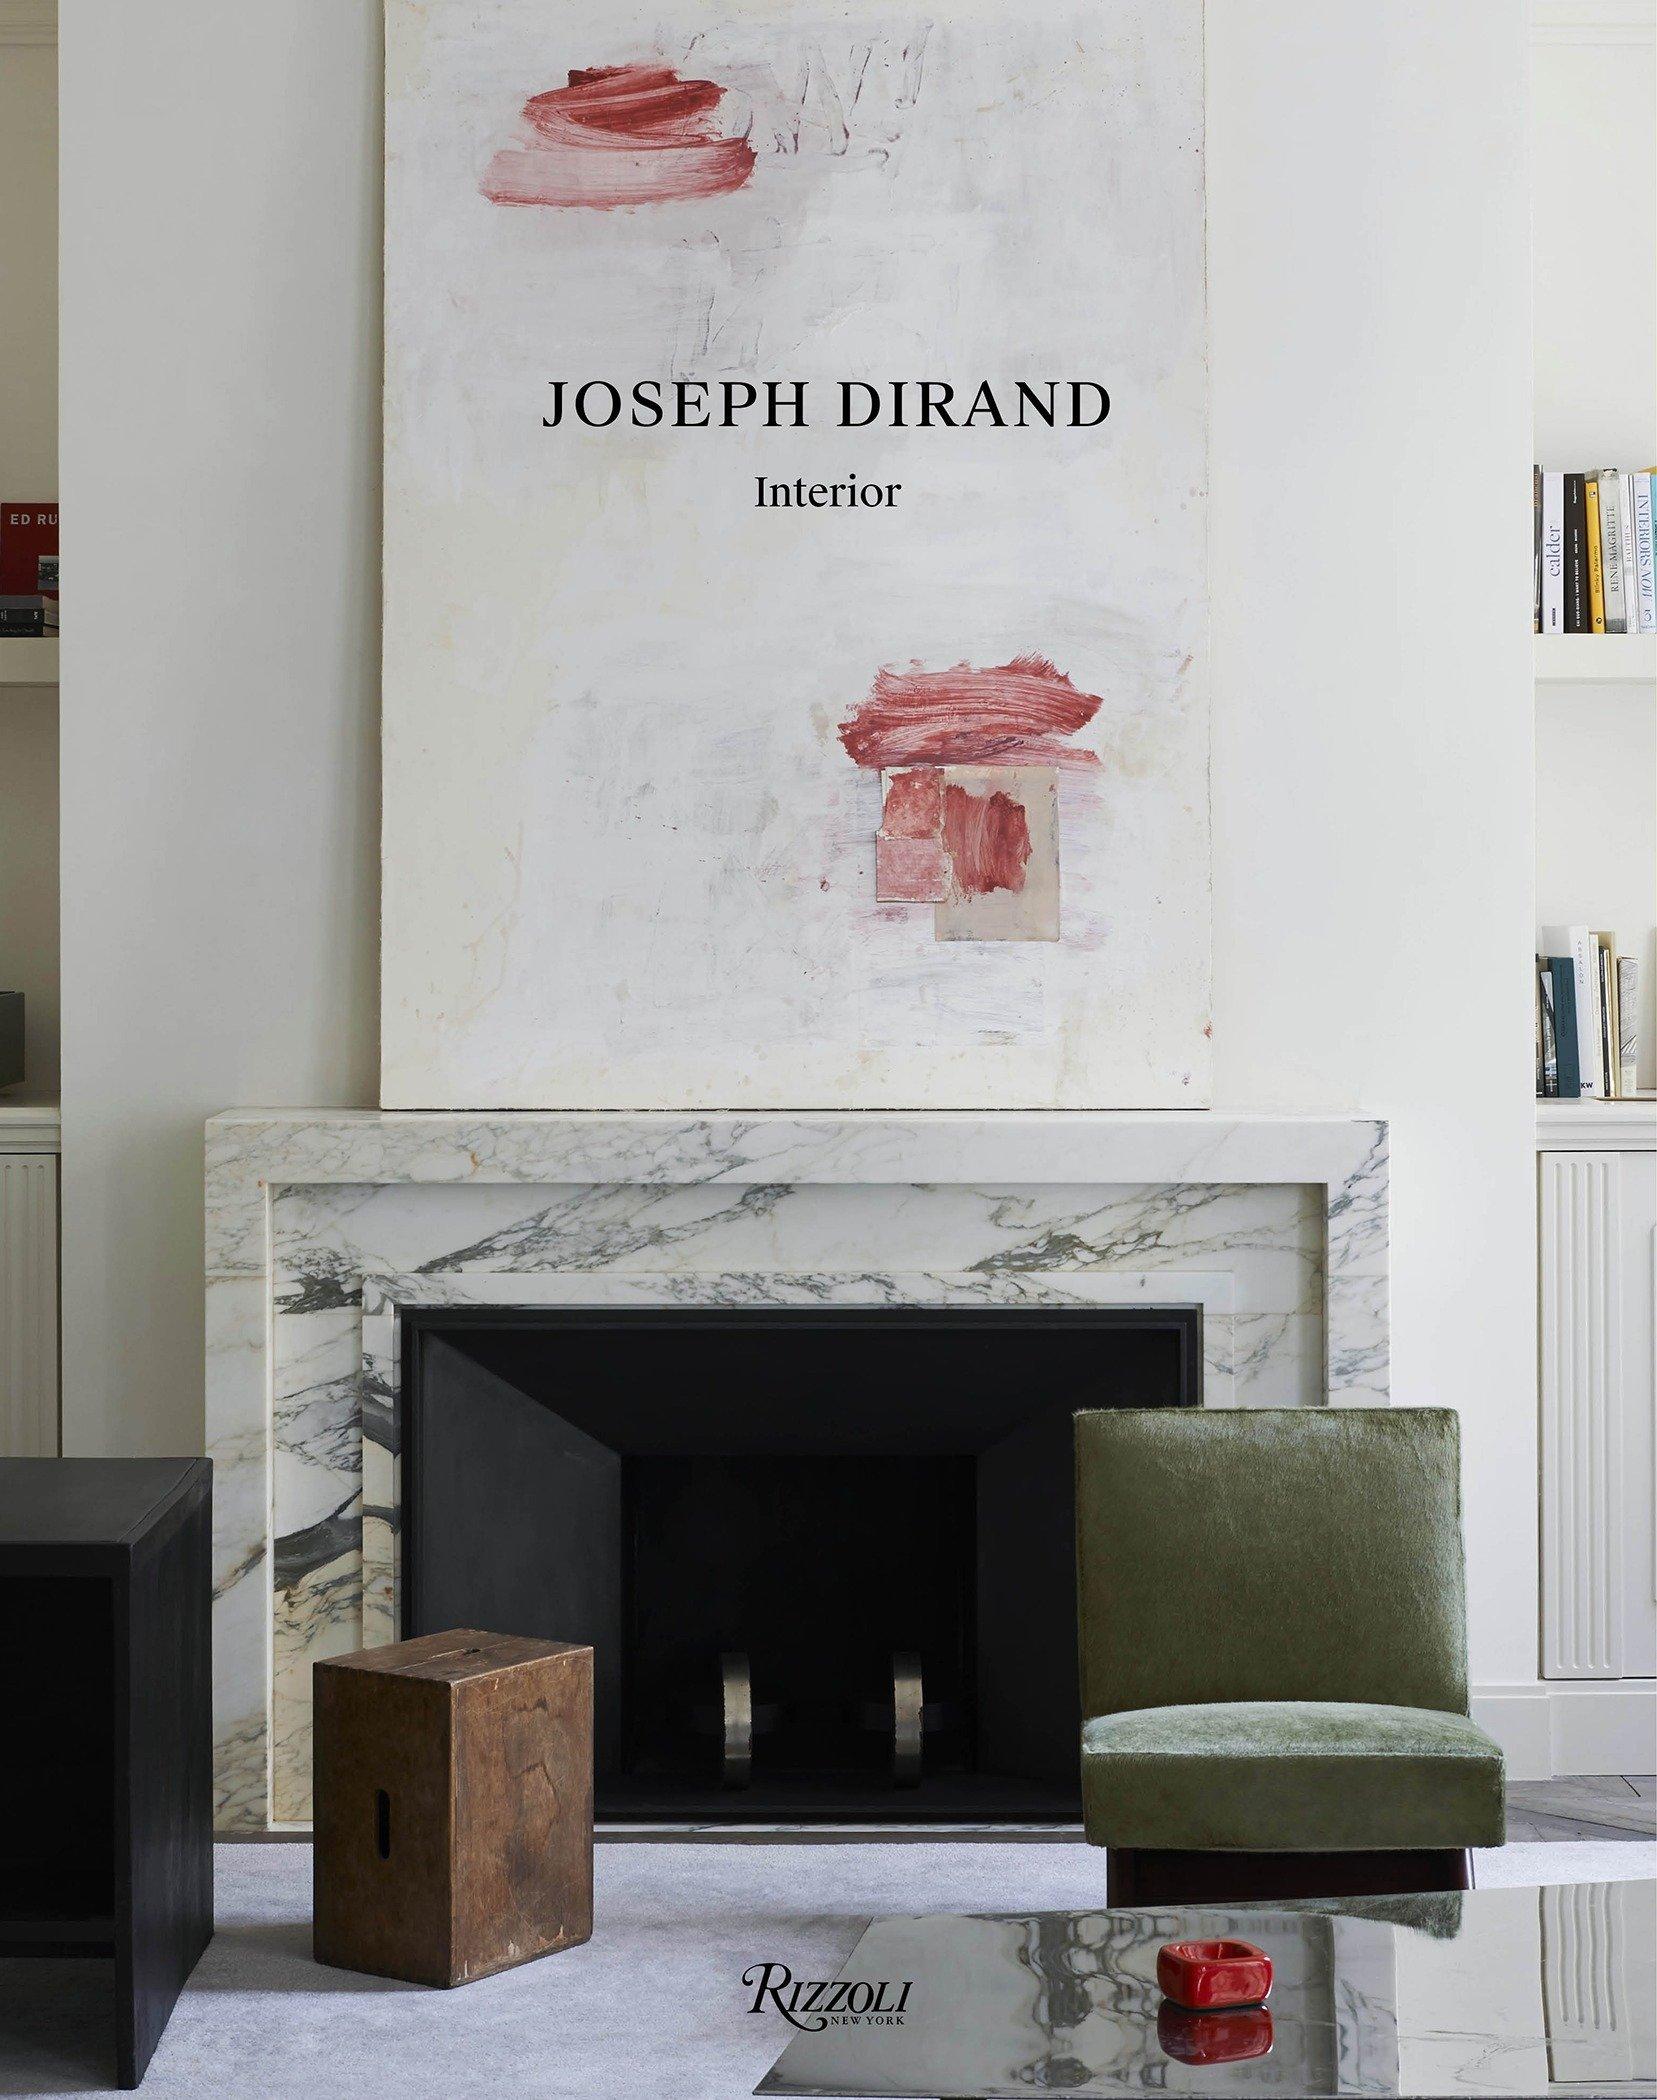 Joseph Dirand: Interior